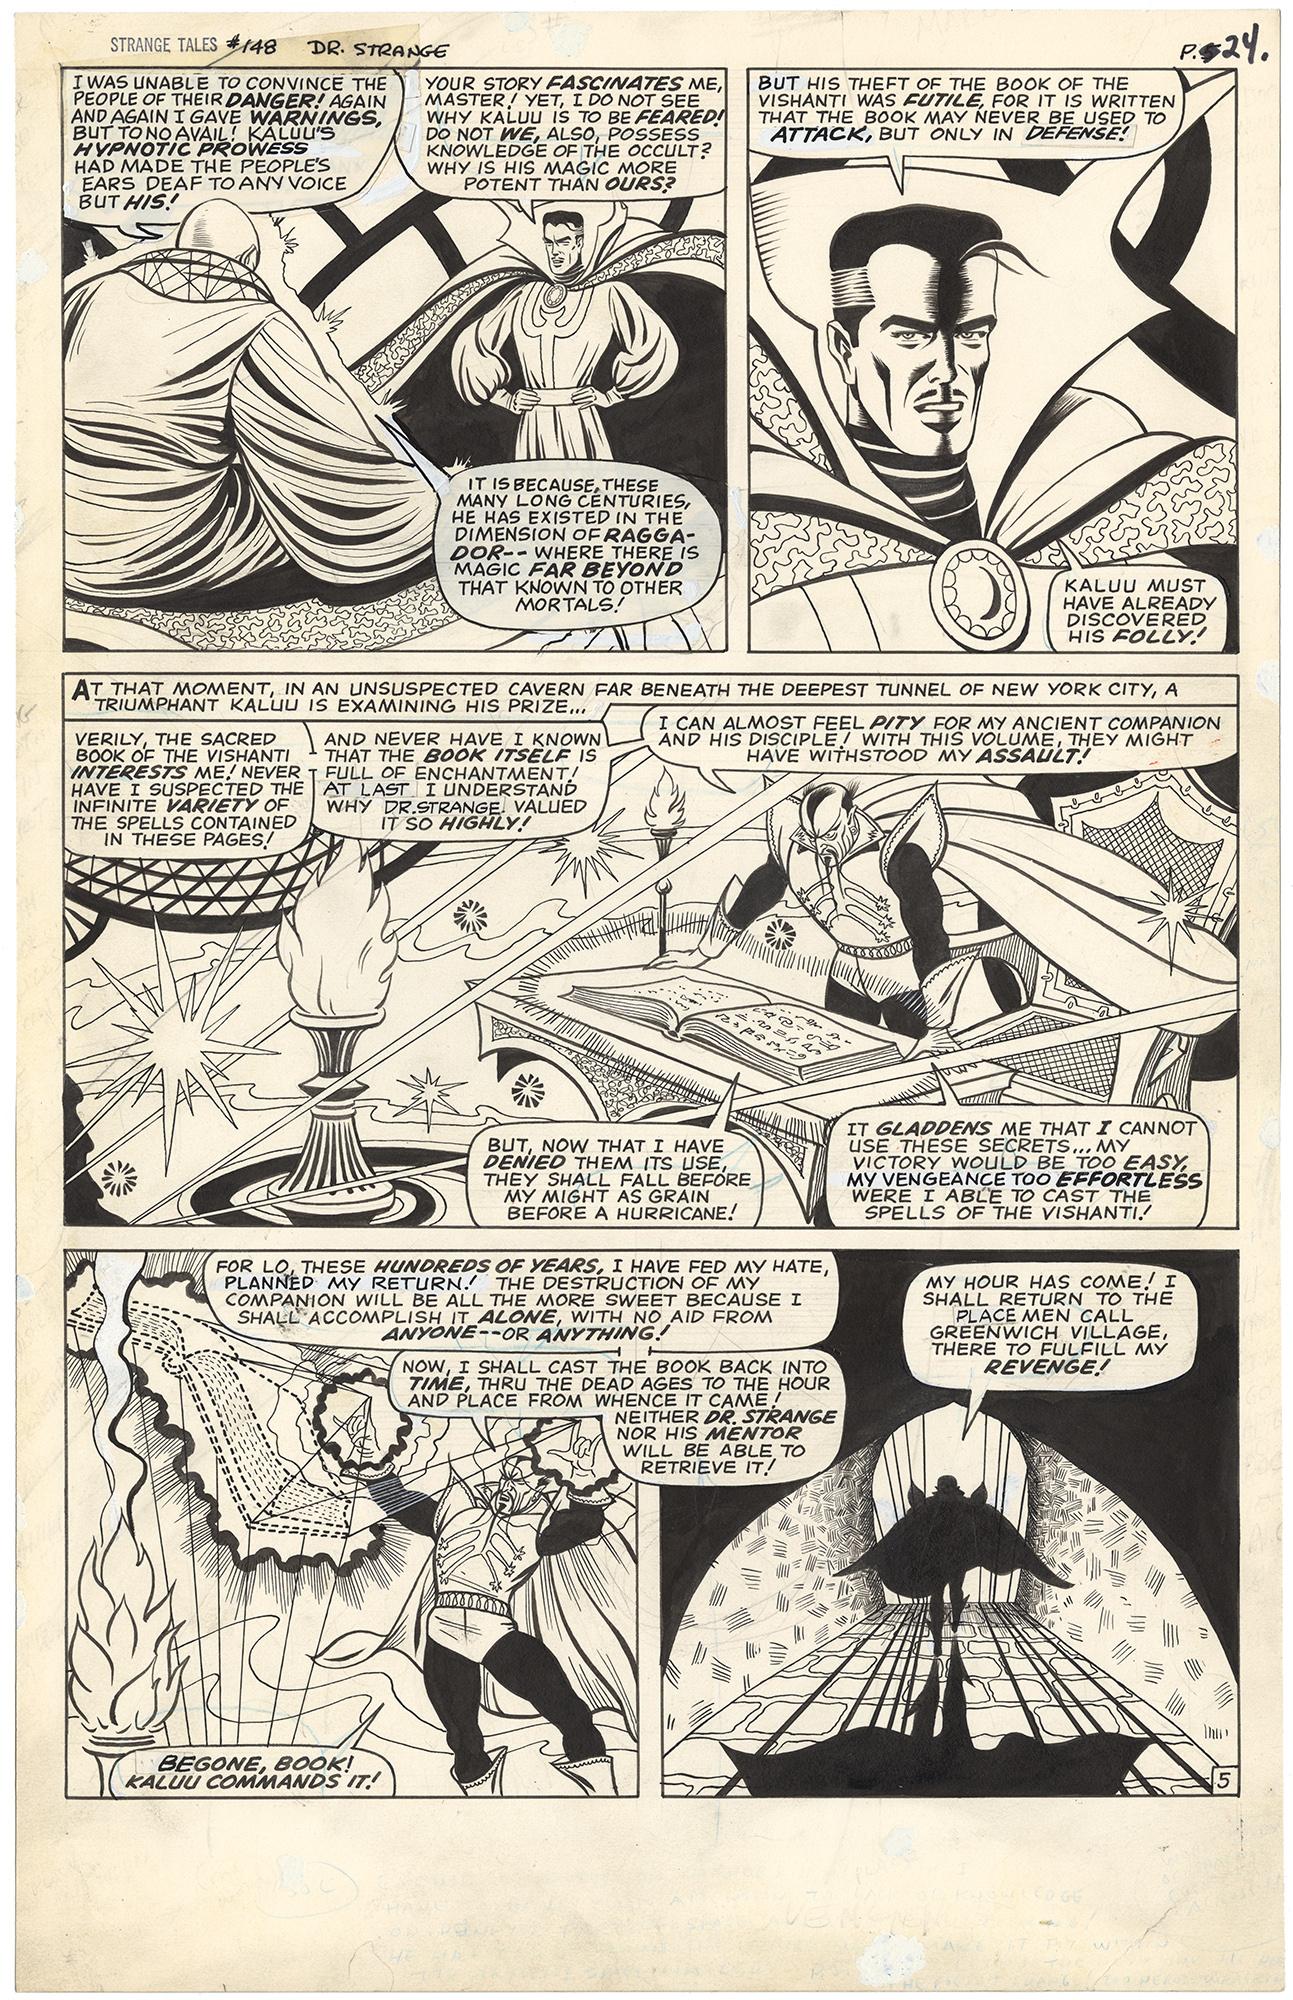 Strange Tales #148 p5